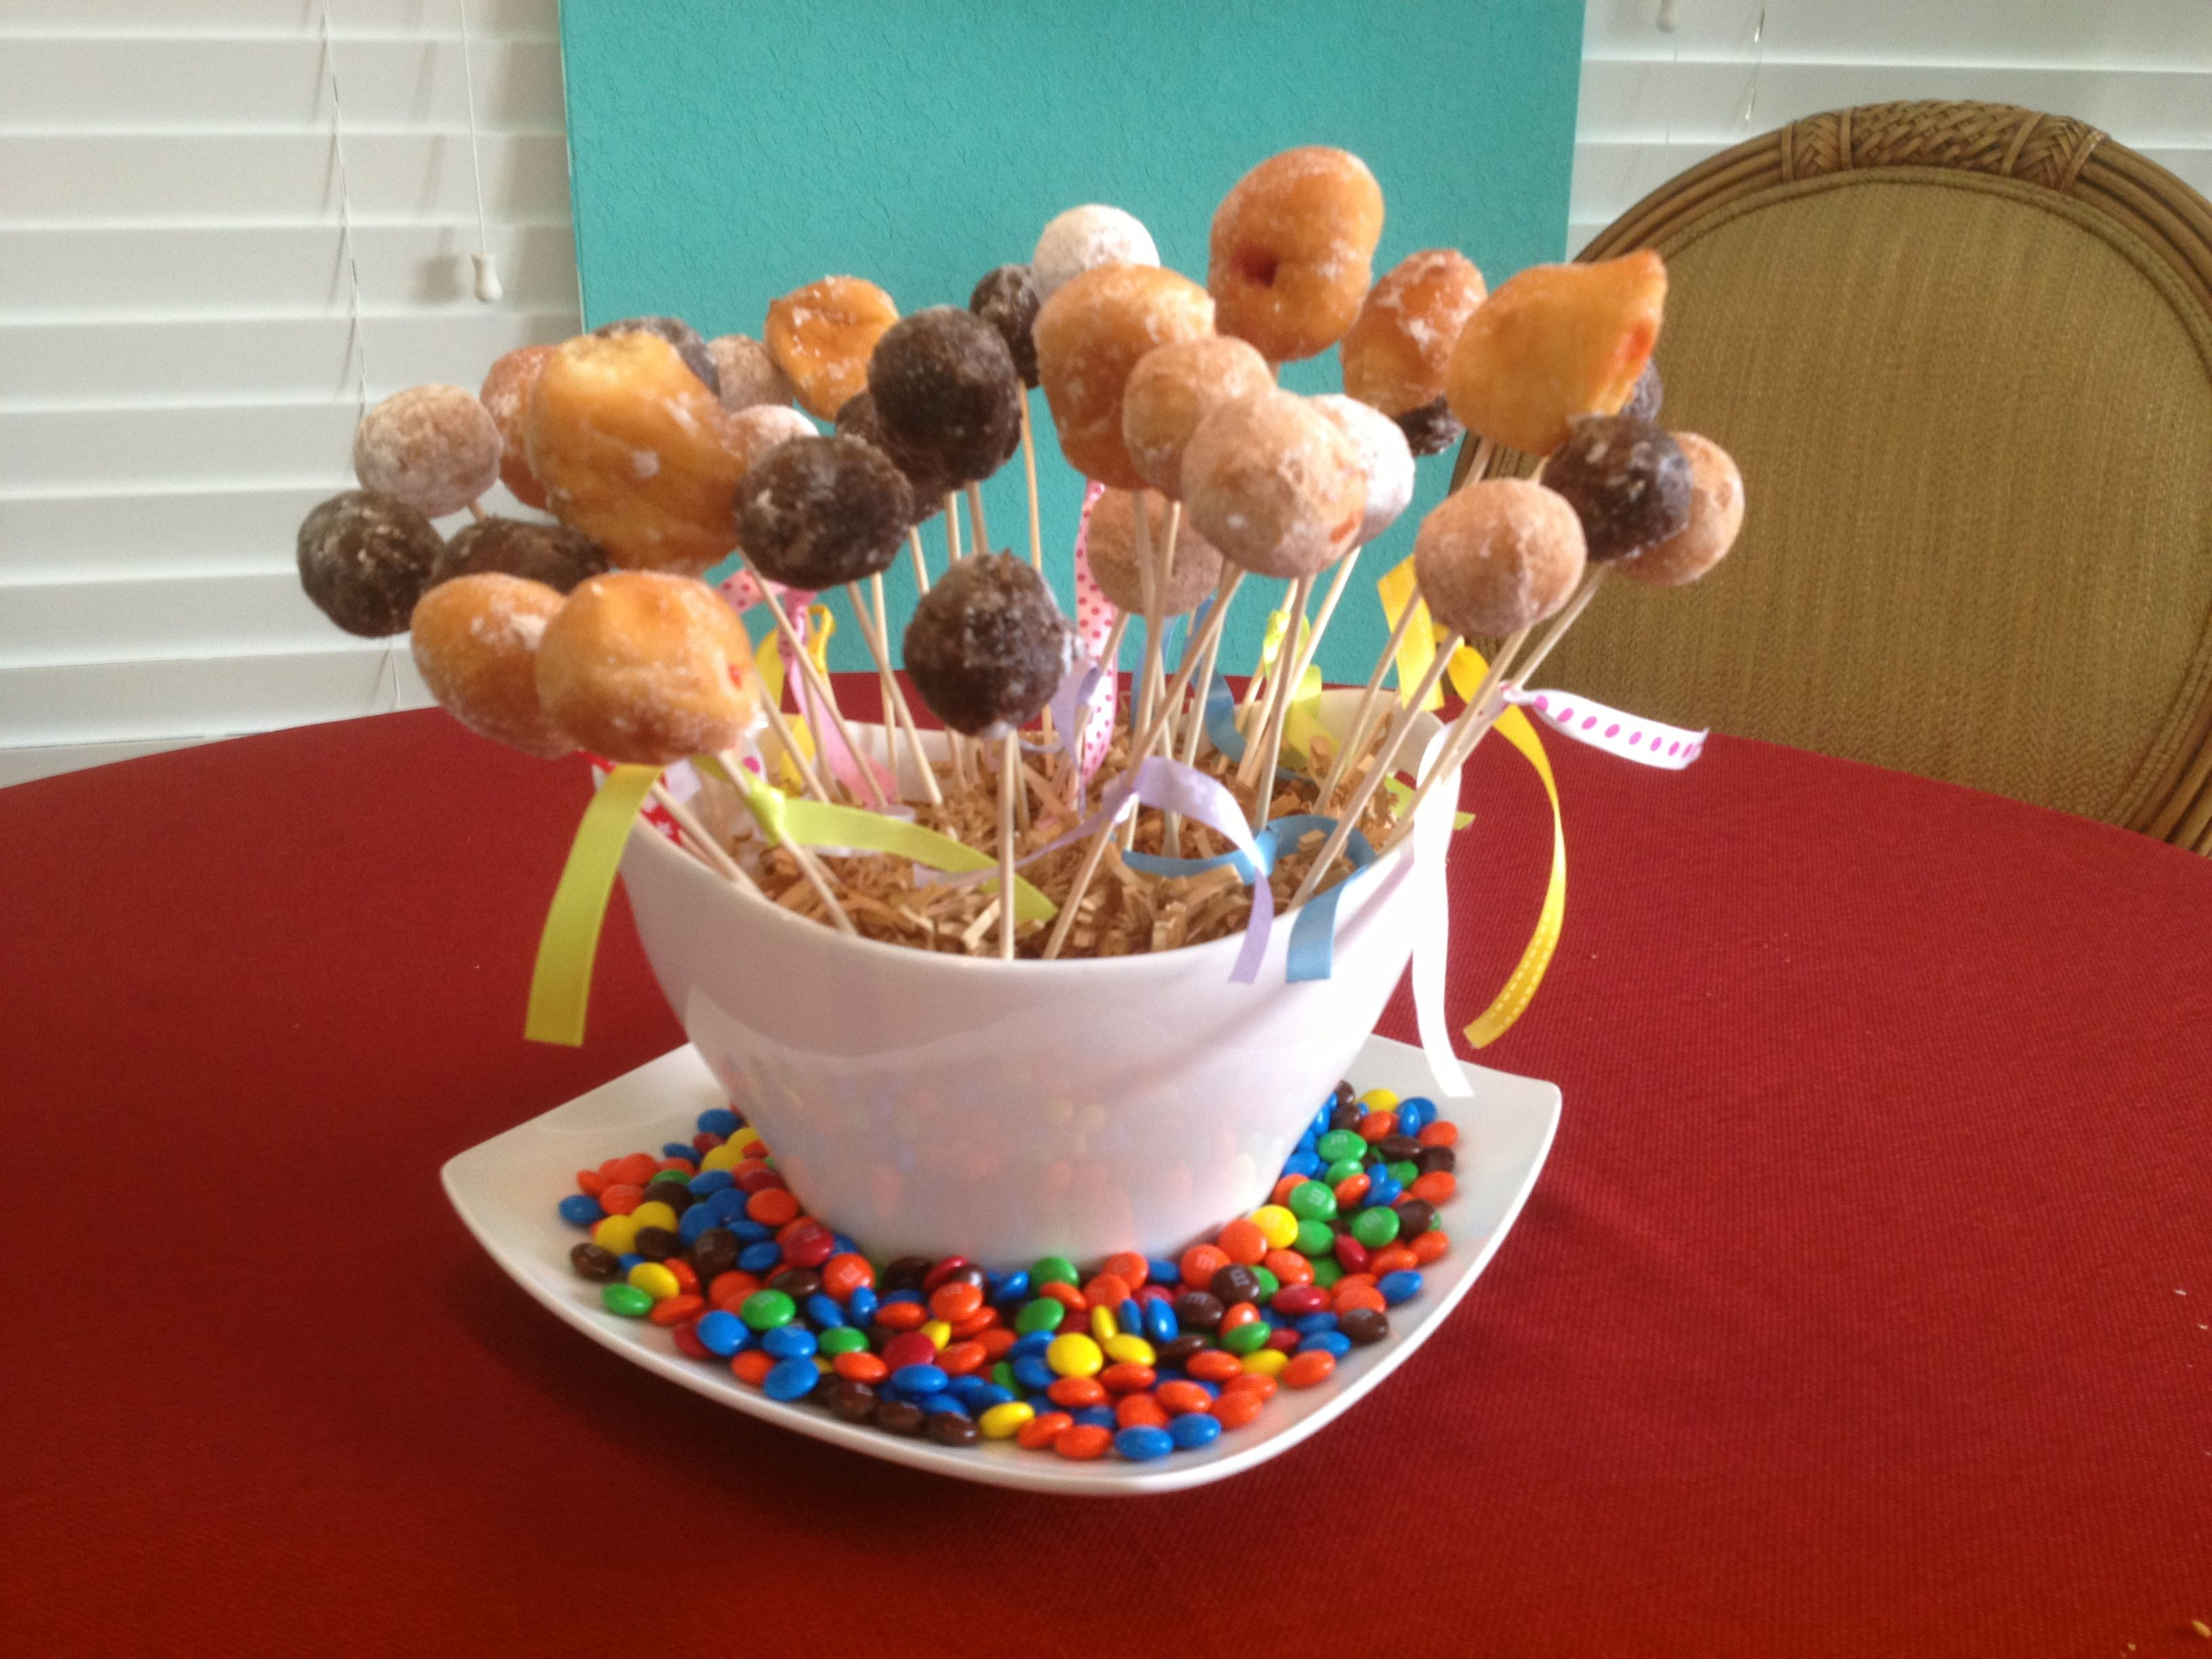 Breakfast donut holes cake breakfast donuts cake cake